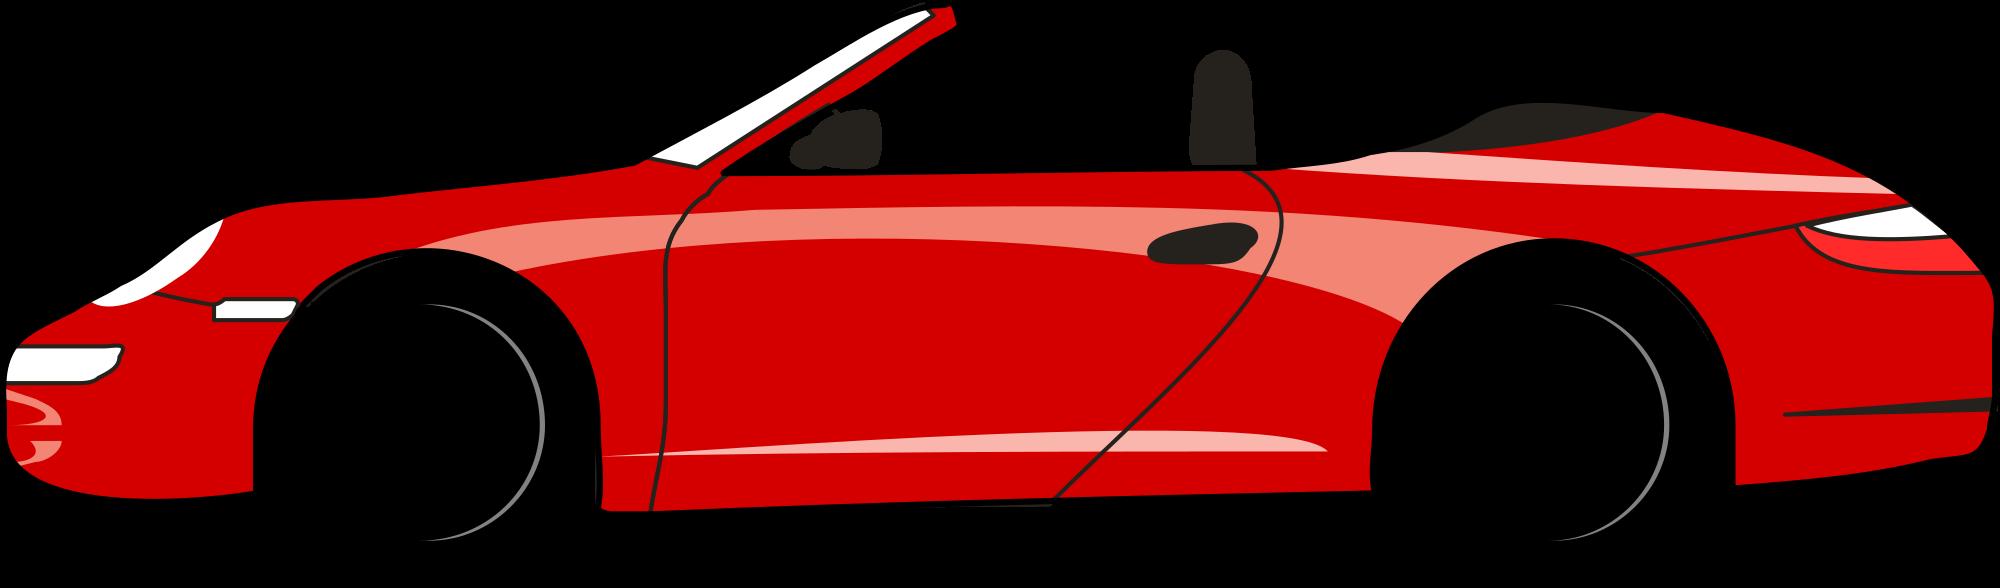 Car Clip Art & Car Clip Art Clip Art Images.